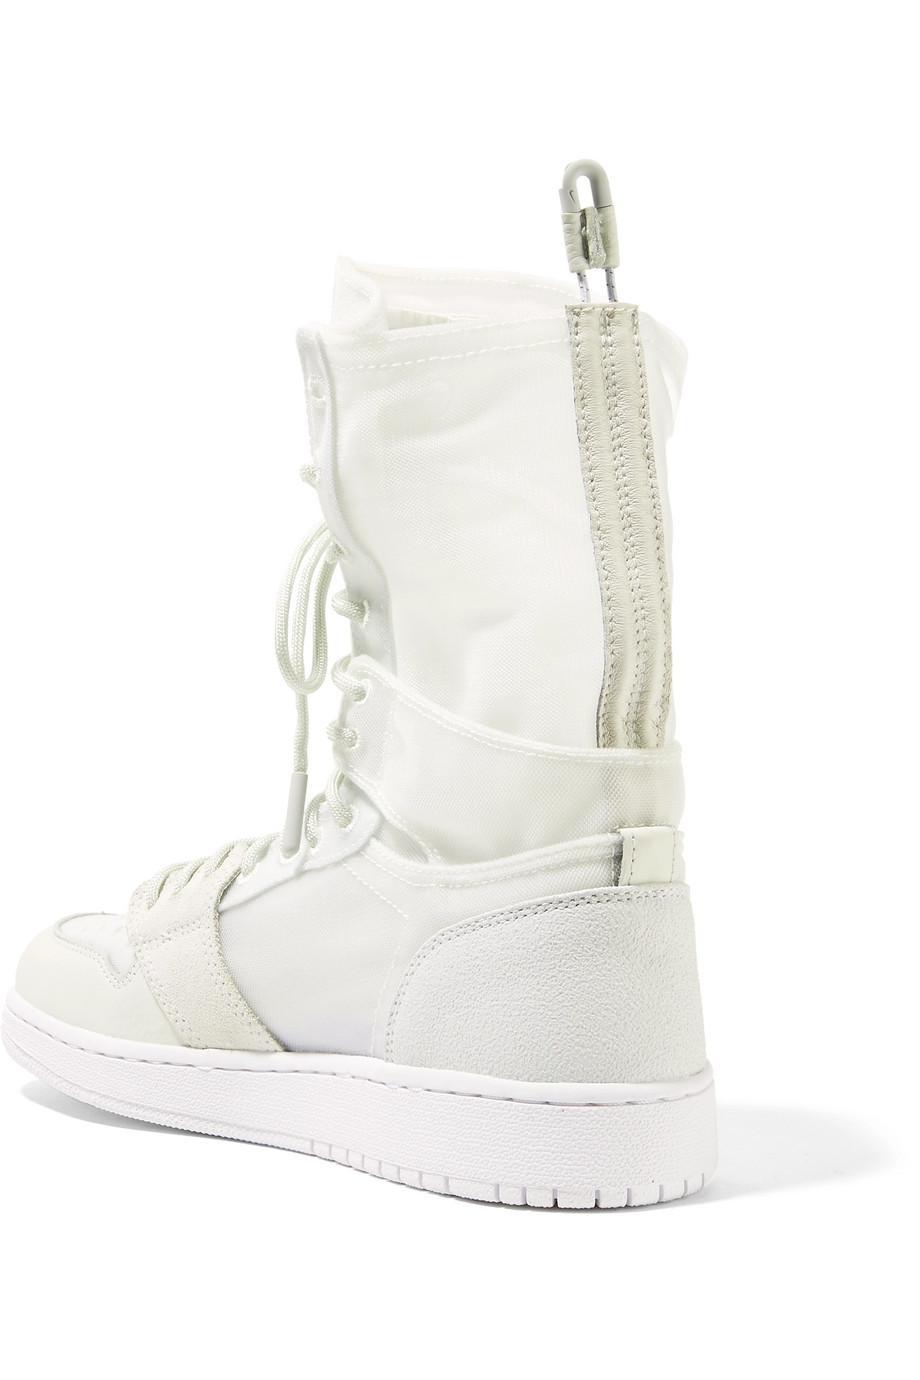 Nike The 1 Reimagined Air Jordan 1